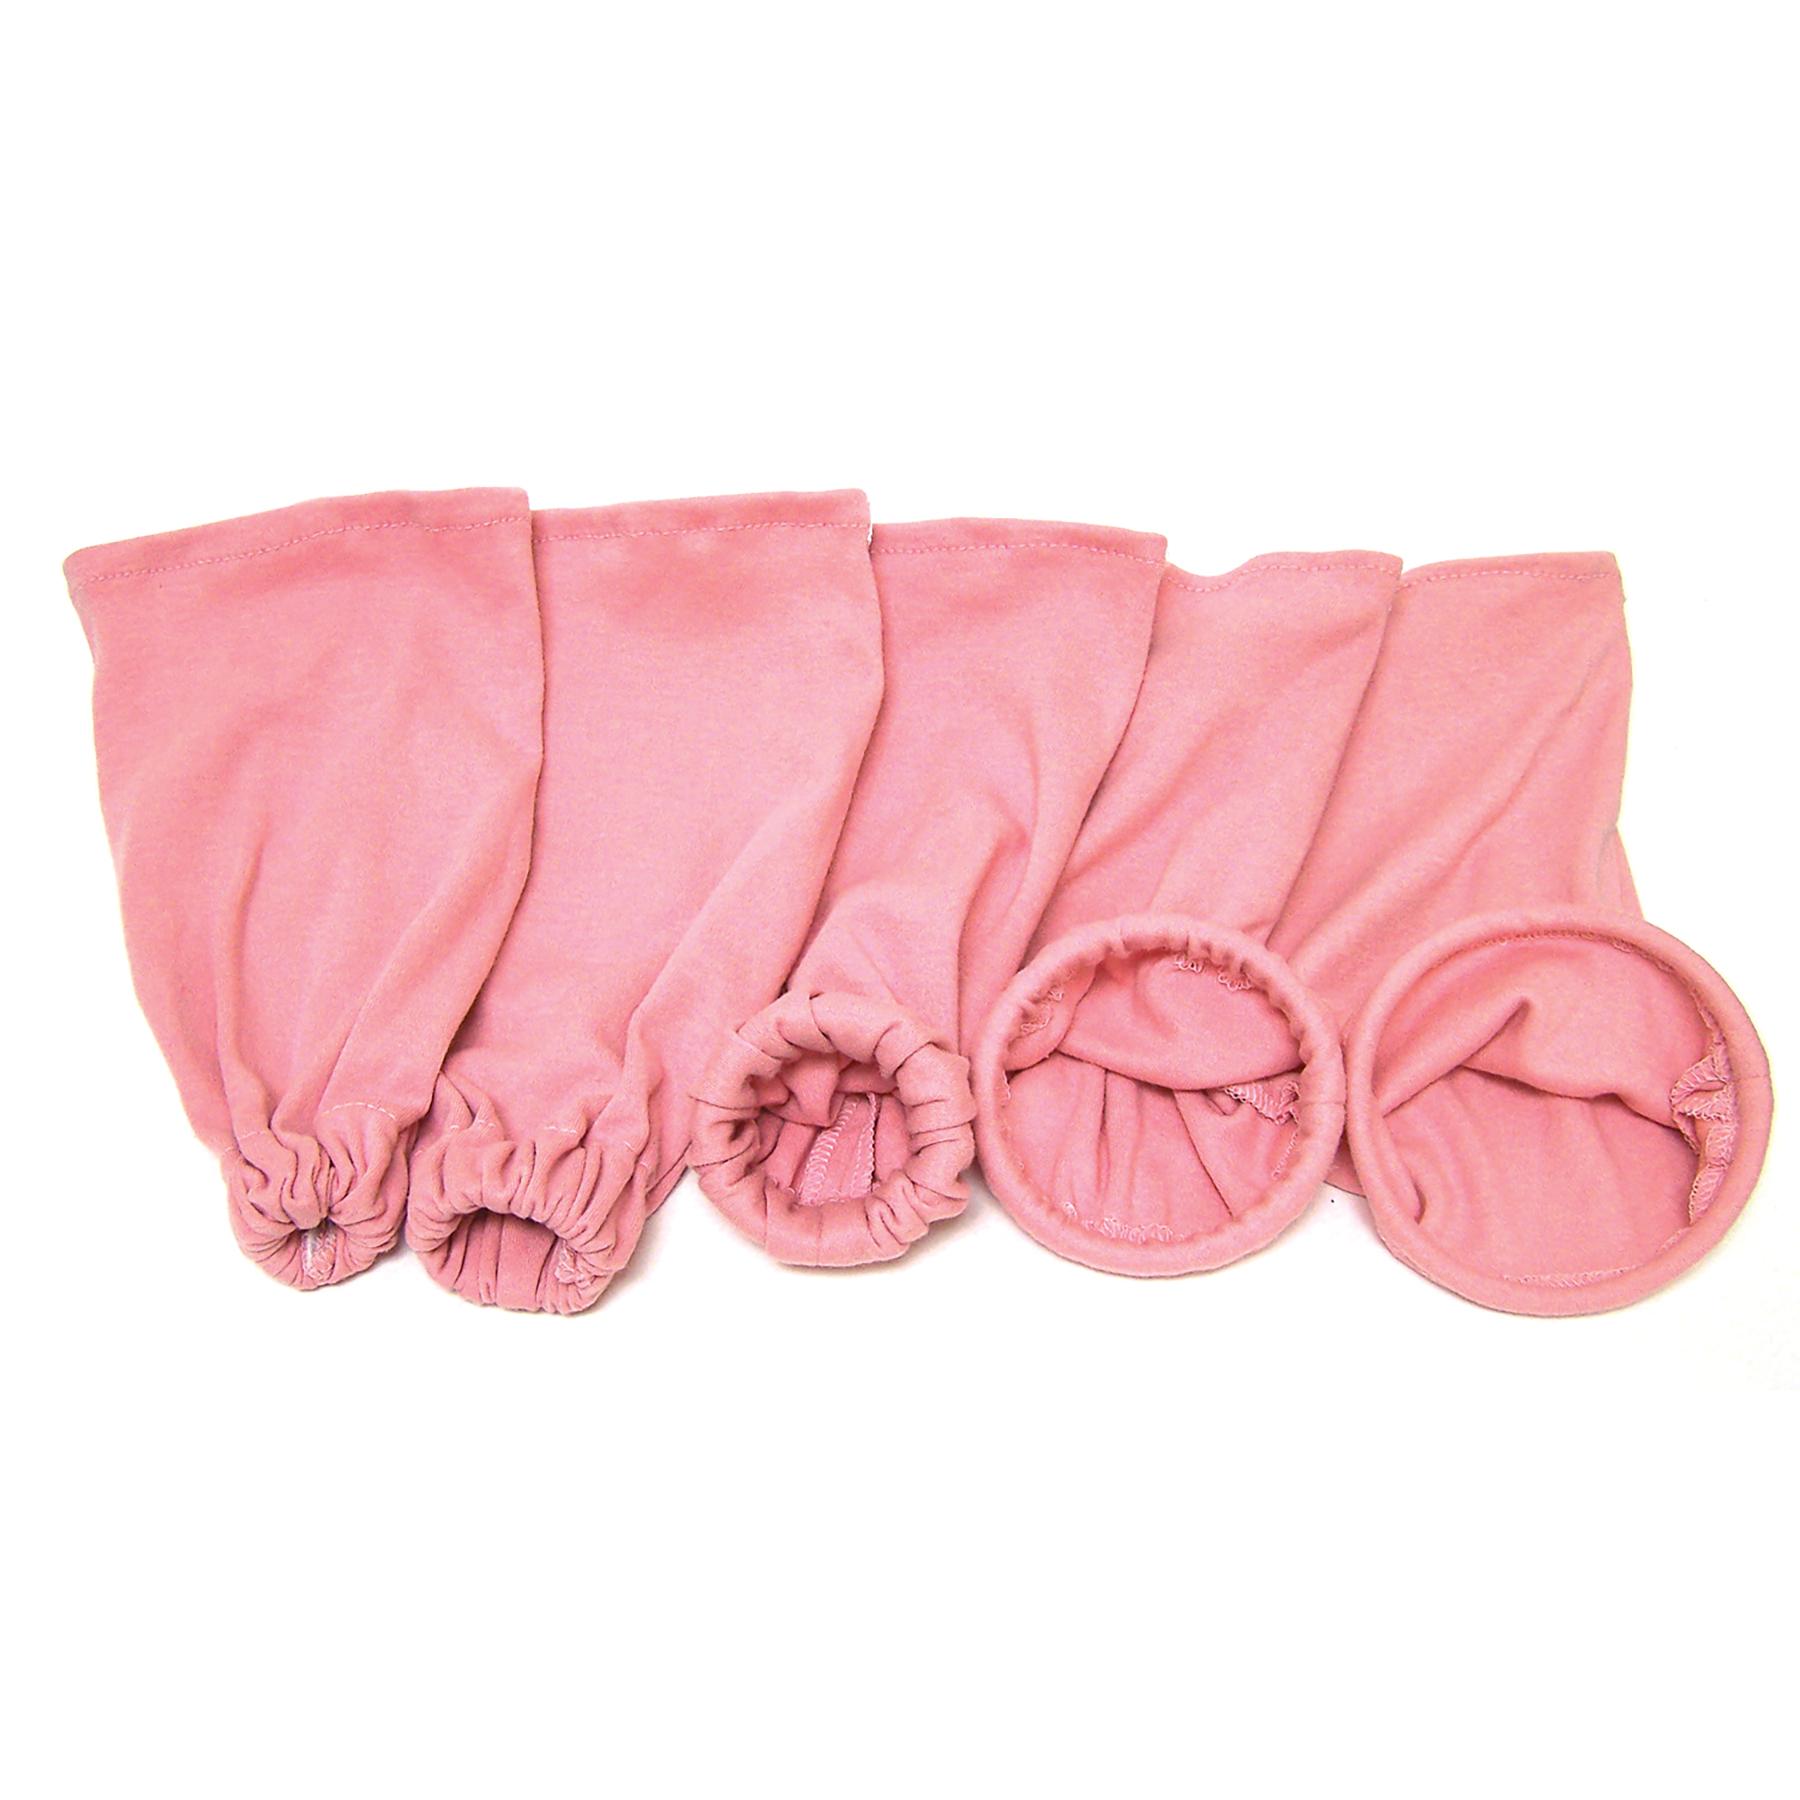 Cloth Cervix Model Set Of 5 Childbirth Graphics